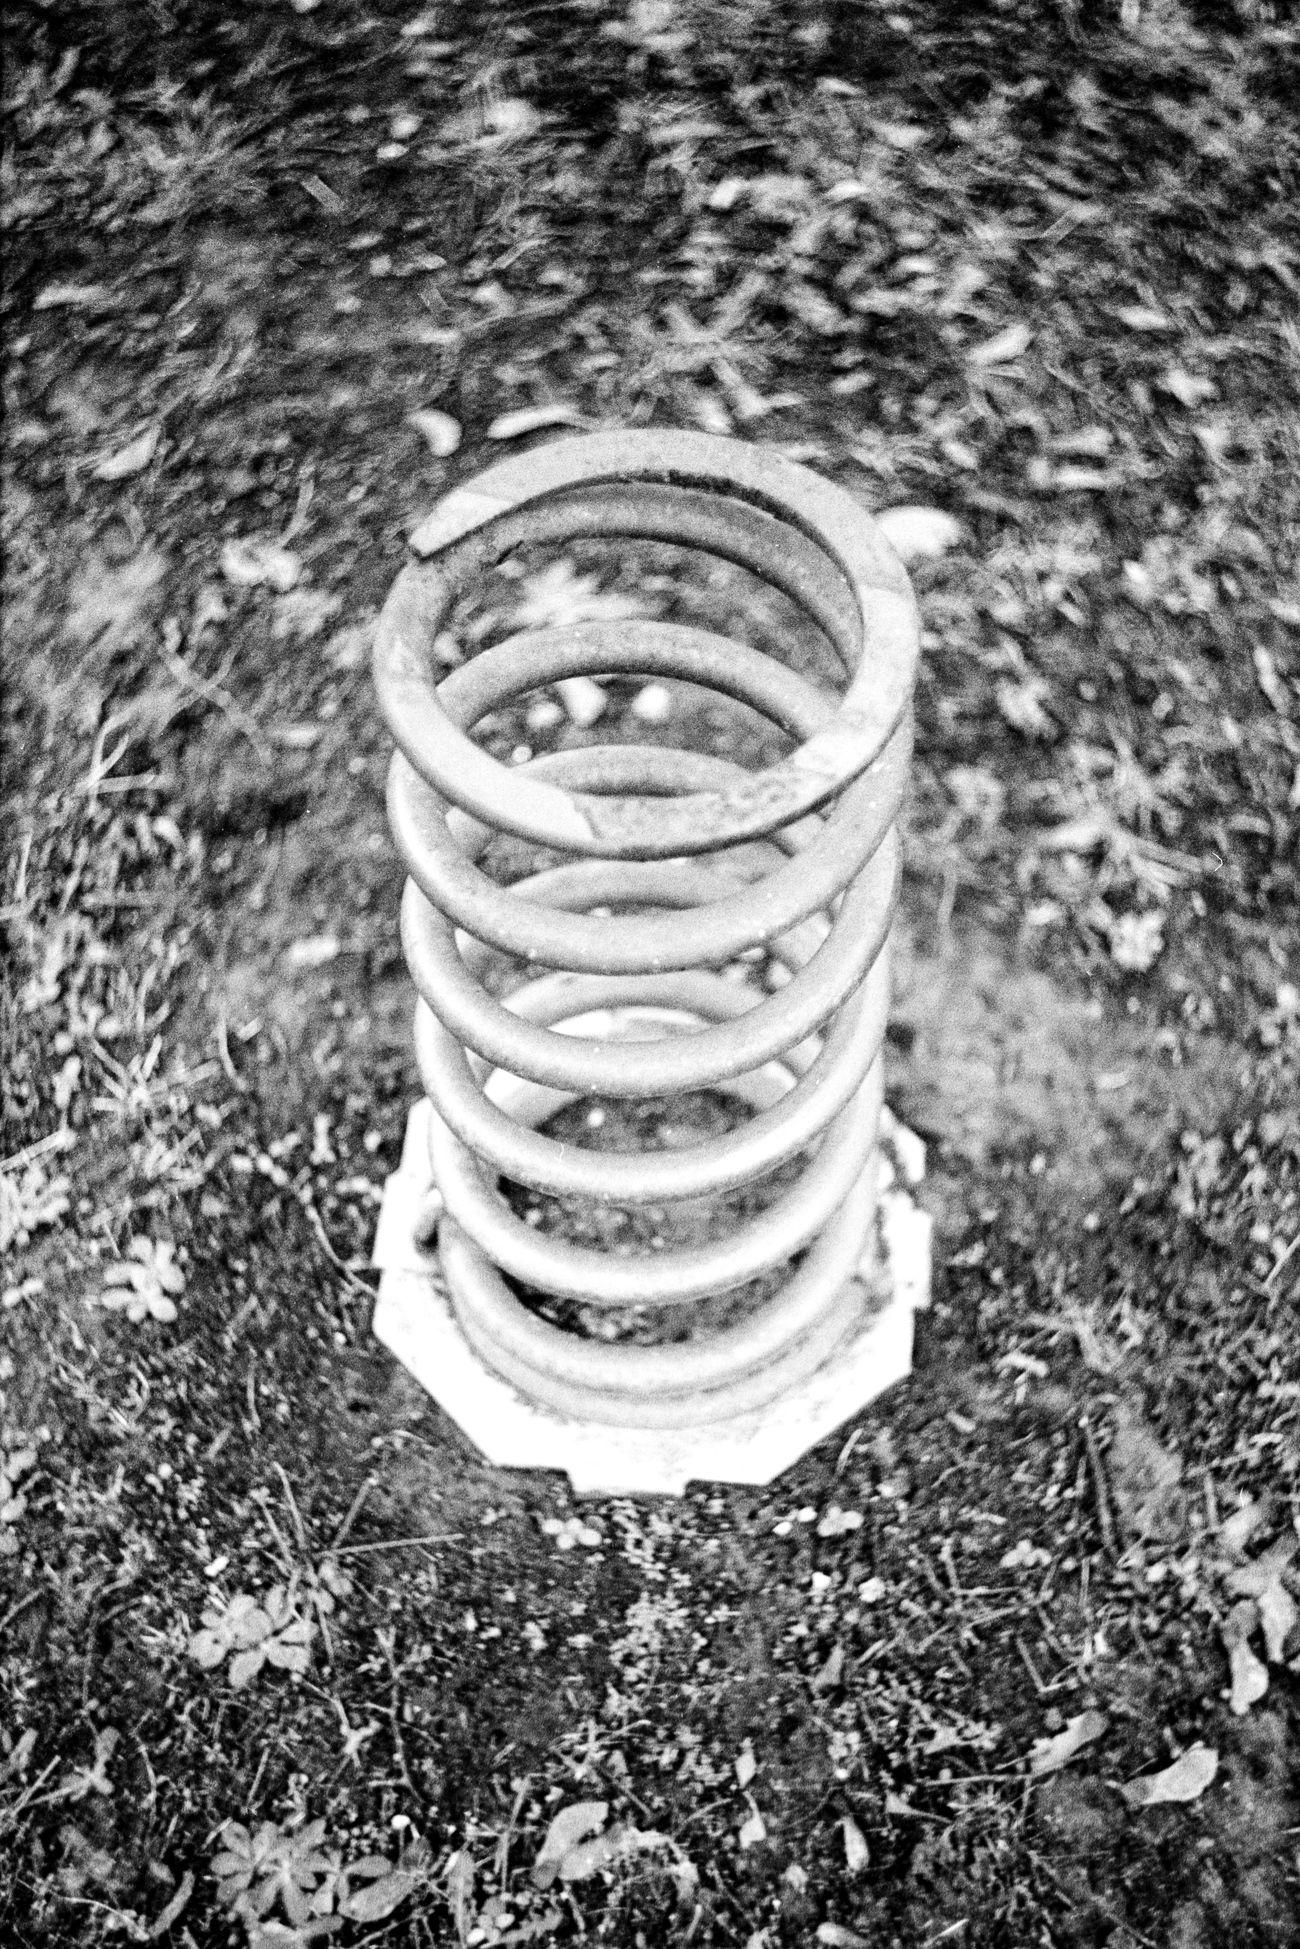 Location: Stauffenbergstraße Praktica MTL5   APX 100 -> 200   D-76 AgfaPhoto APX 100 (new) Blackandwhite EyeEm Best Shots - Black + White Film Photography Kodak D-76 Monochrome Praktica MTL 5